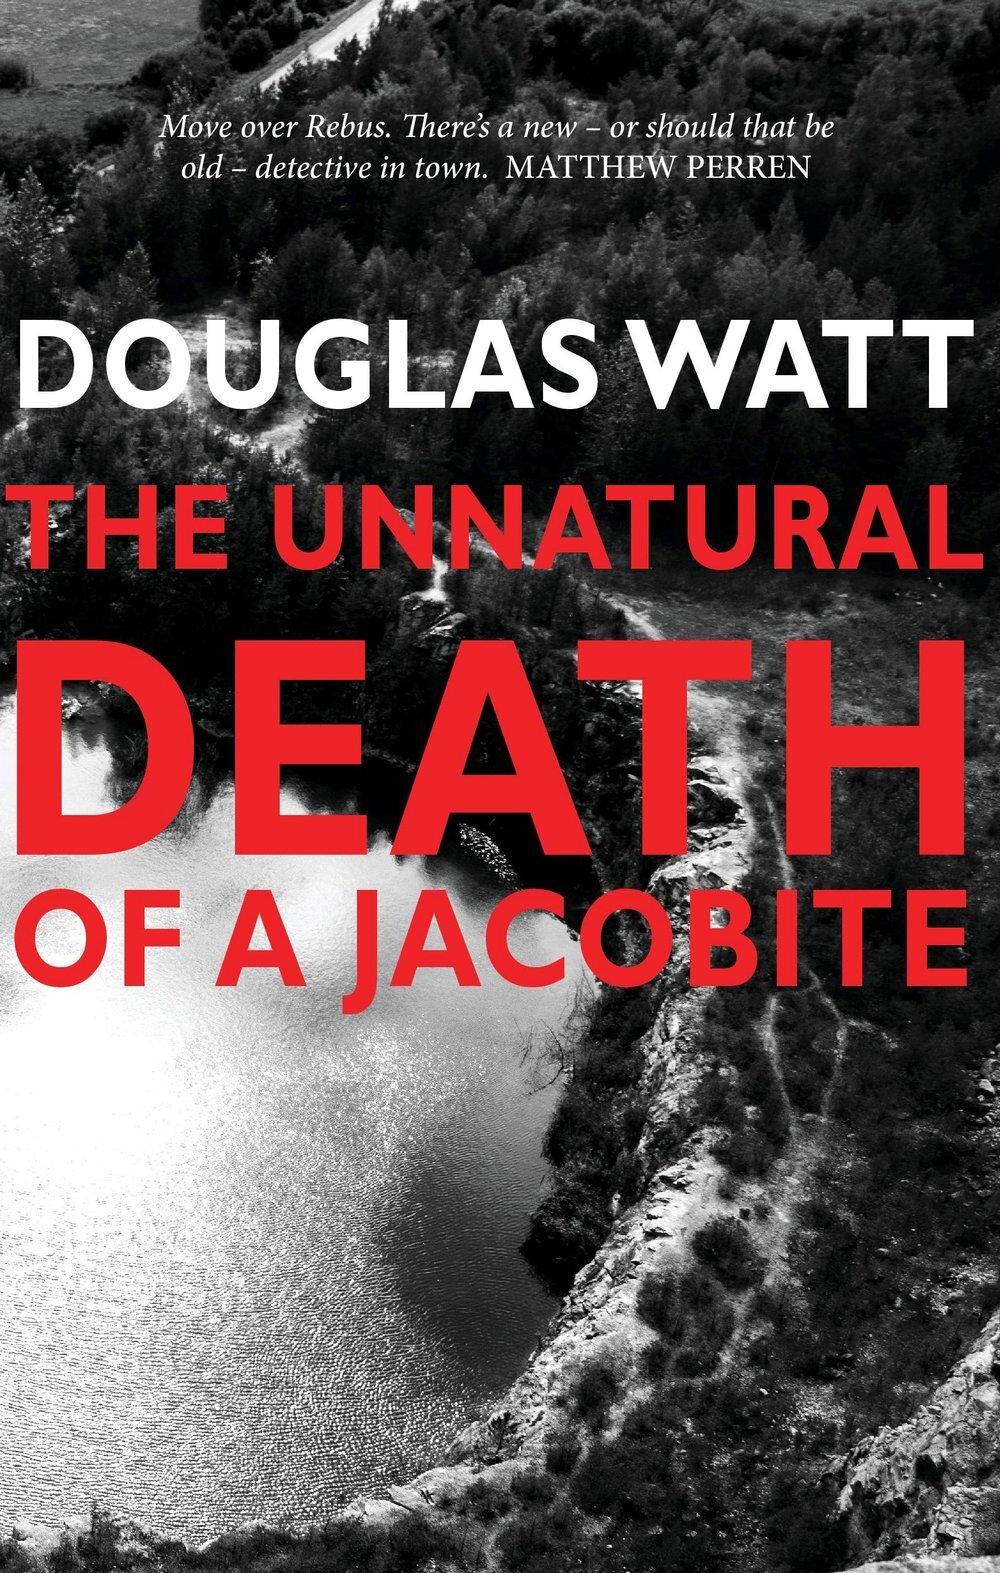 The+Unnatural+Death+of+a+Jacobite+Douglas+Watt+Luath+Press+9781912147618.jpg